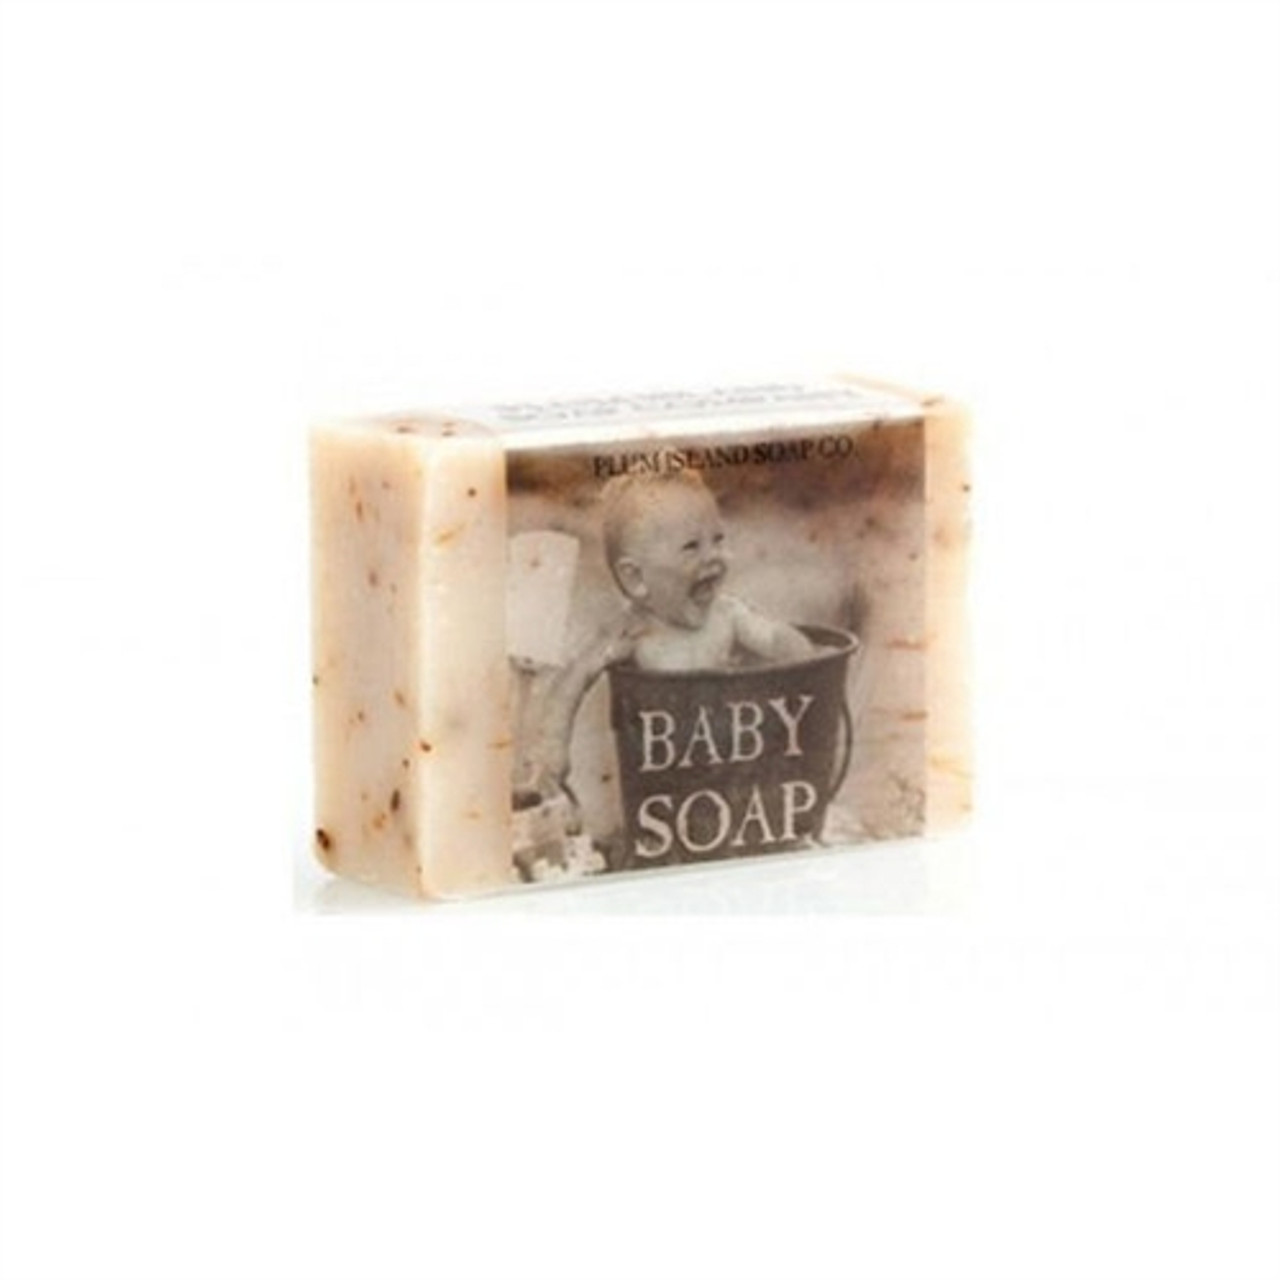 Organic Baby Soap - Plum Island